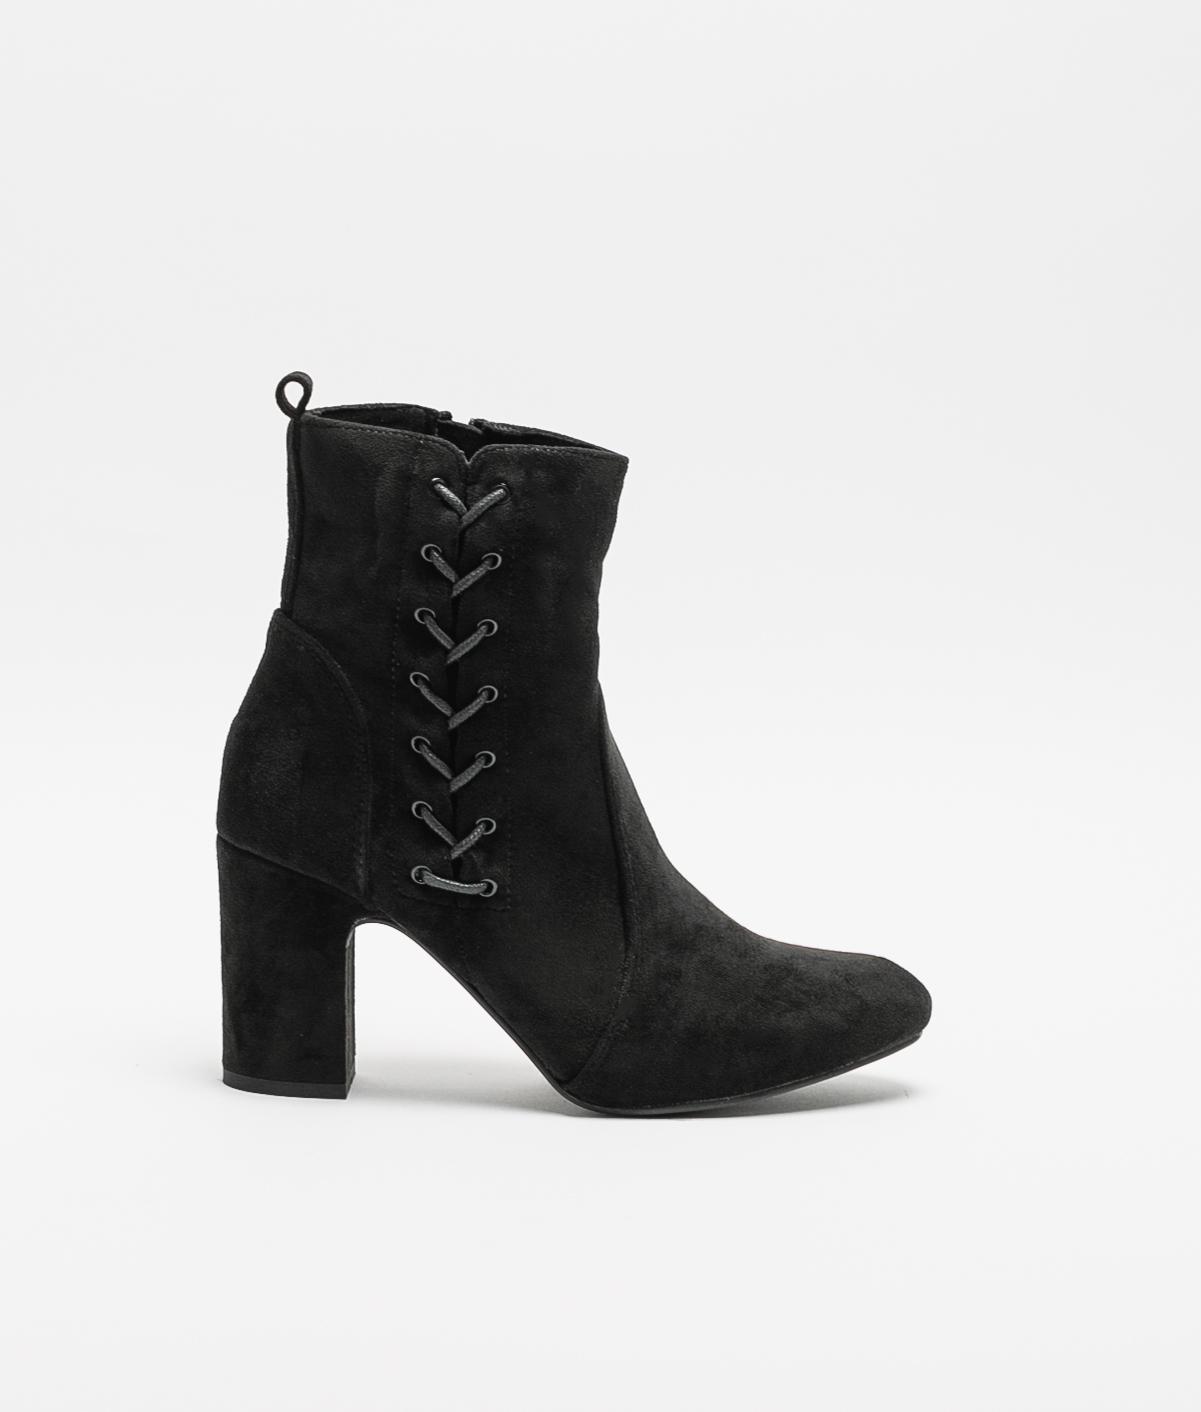 Malin Low Boot - Black